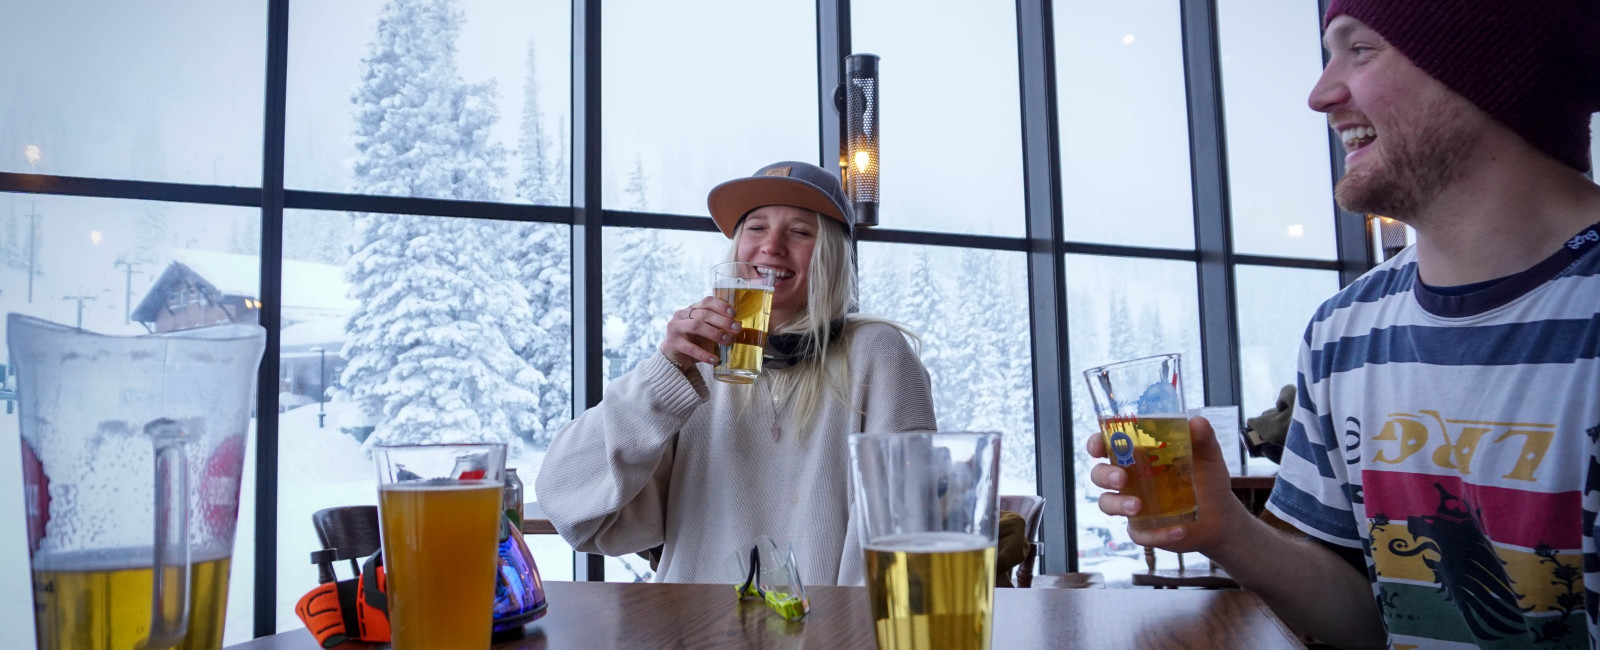 The 7 Habits of Skiers: Communication via Après-ski